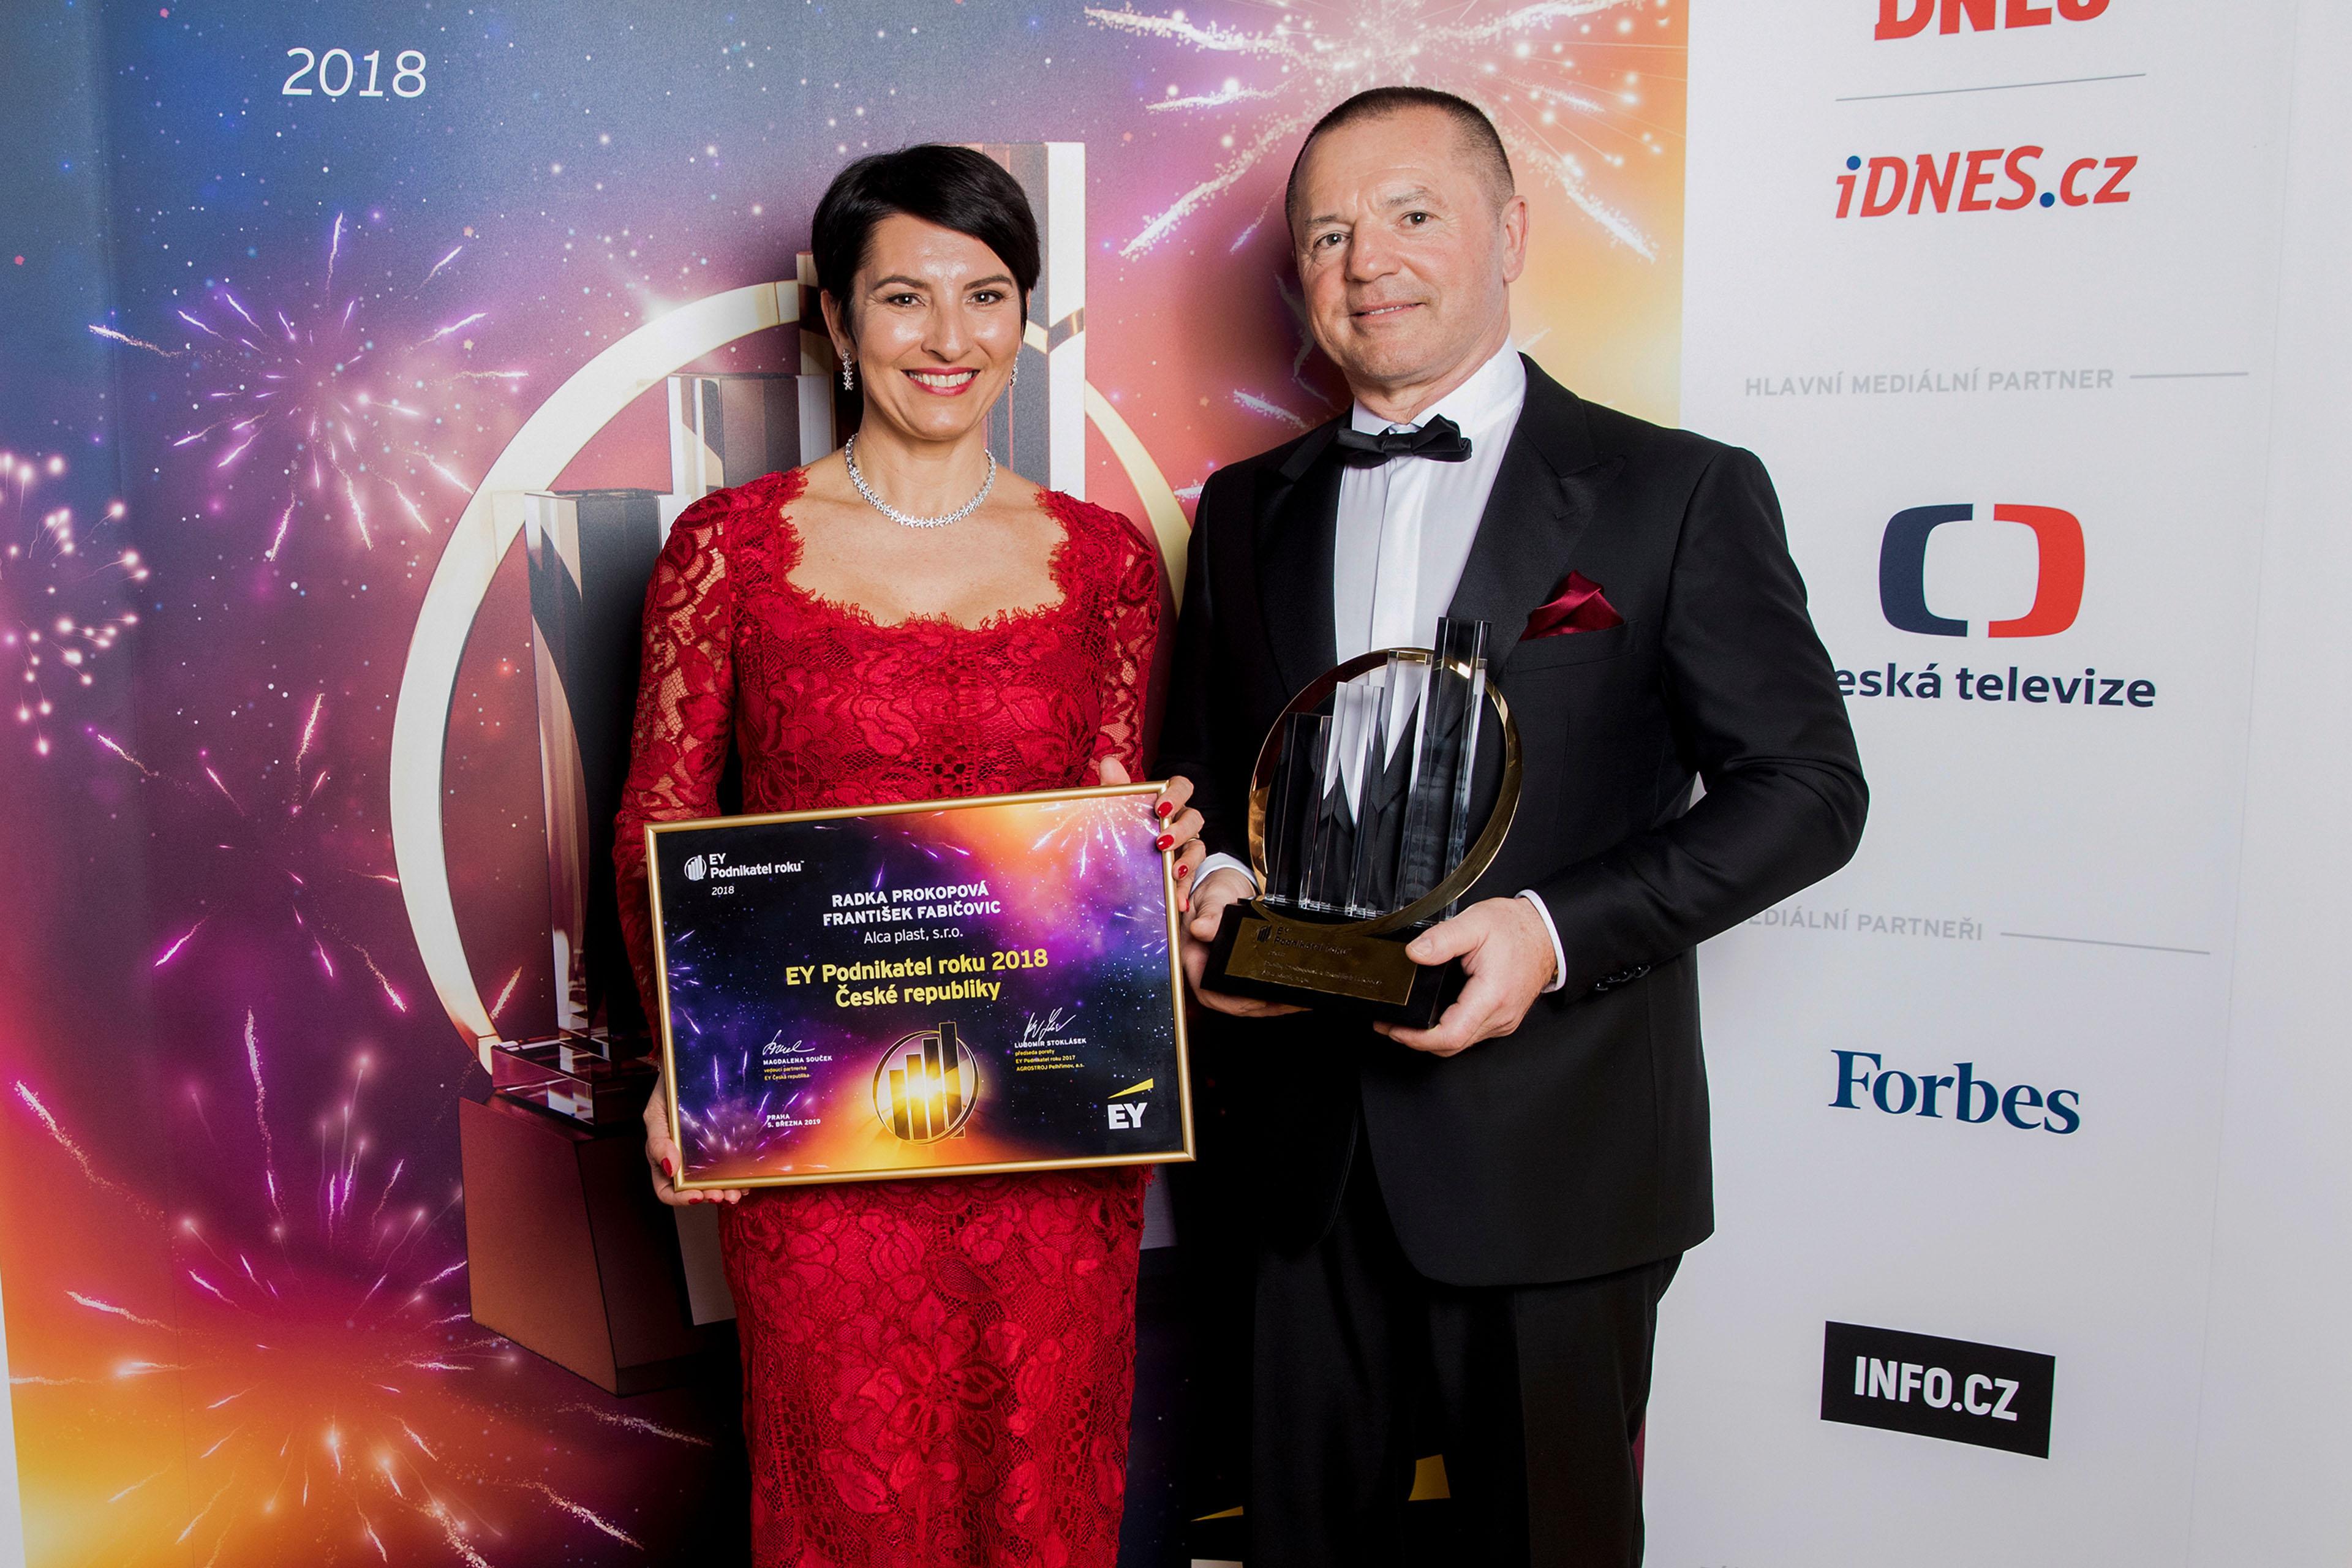 2019 Entrepreneur Radka Prokopová František Fabičovic